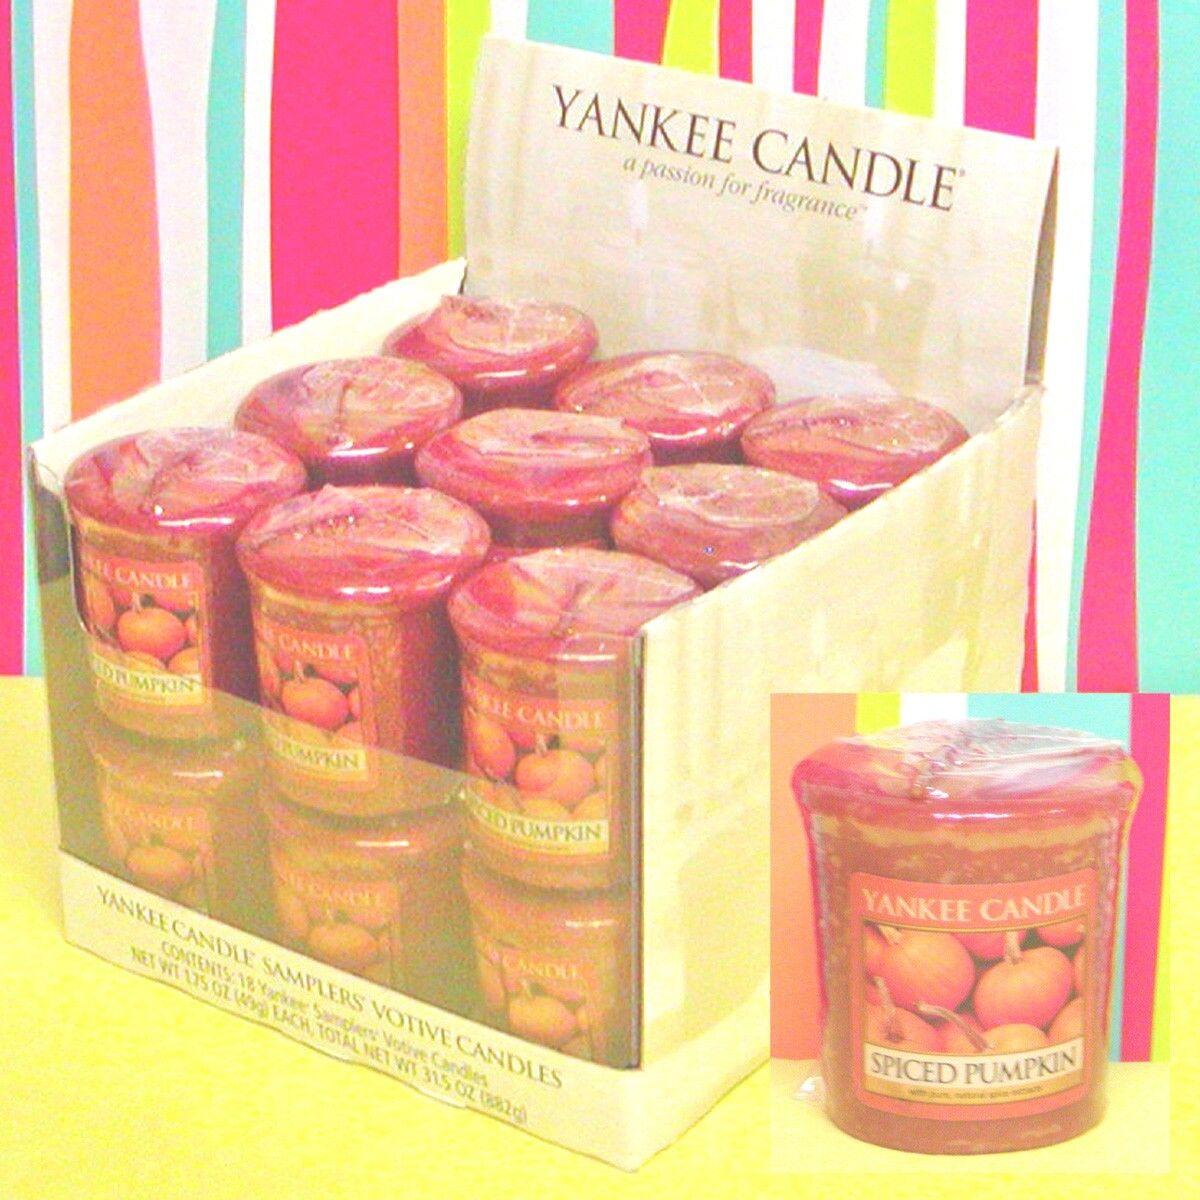 (P-Z) Yankee Candle VOTIVE CANDLES Case 18 Votives - SCENT CHOICES New & Retirot